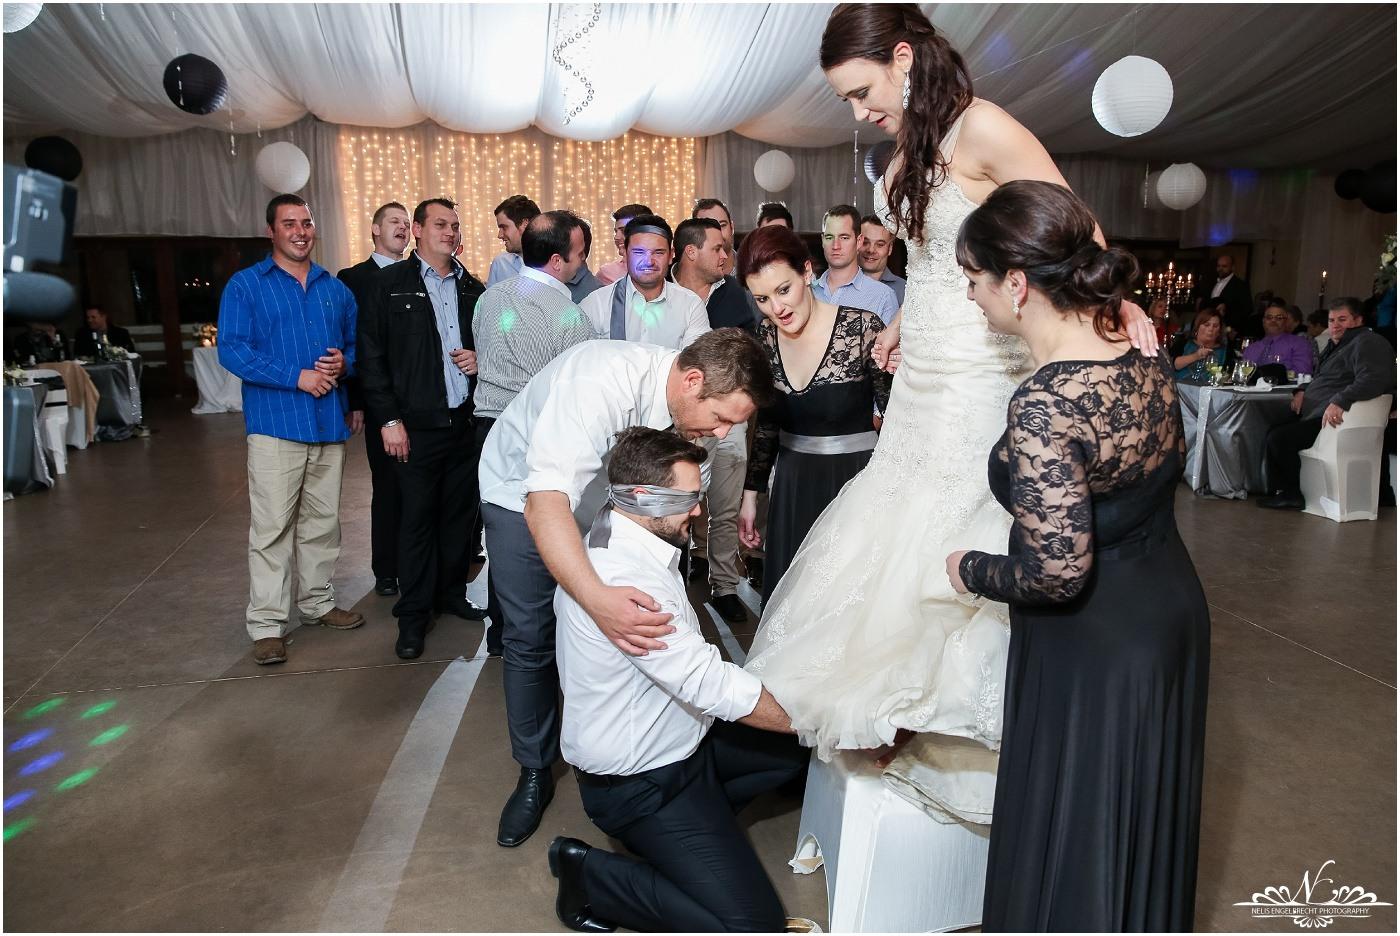 Eensgezind-Wedding-Photos-Nelis-Engelbrecht-Photography-214